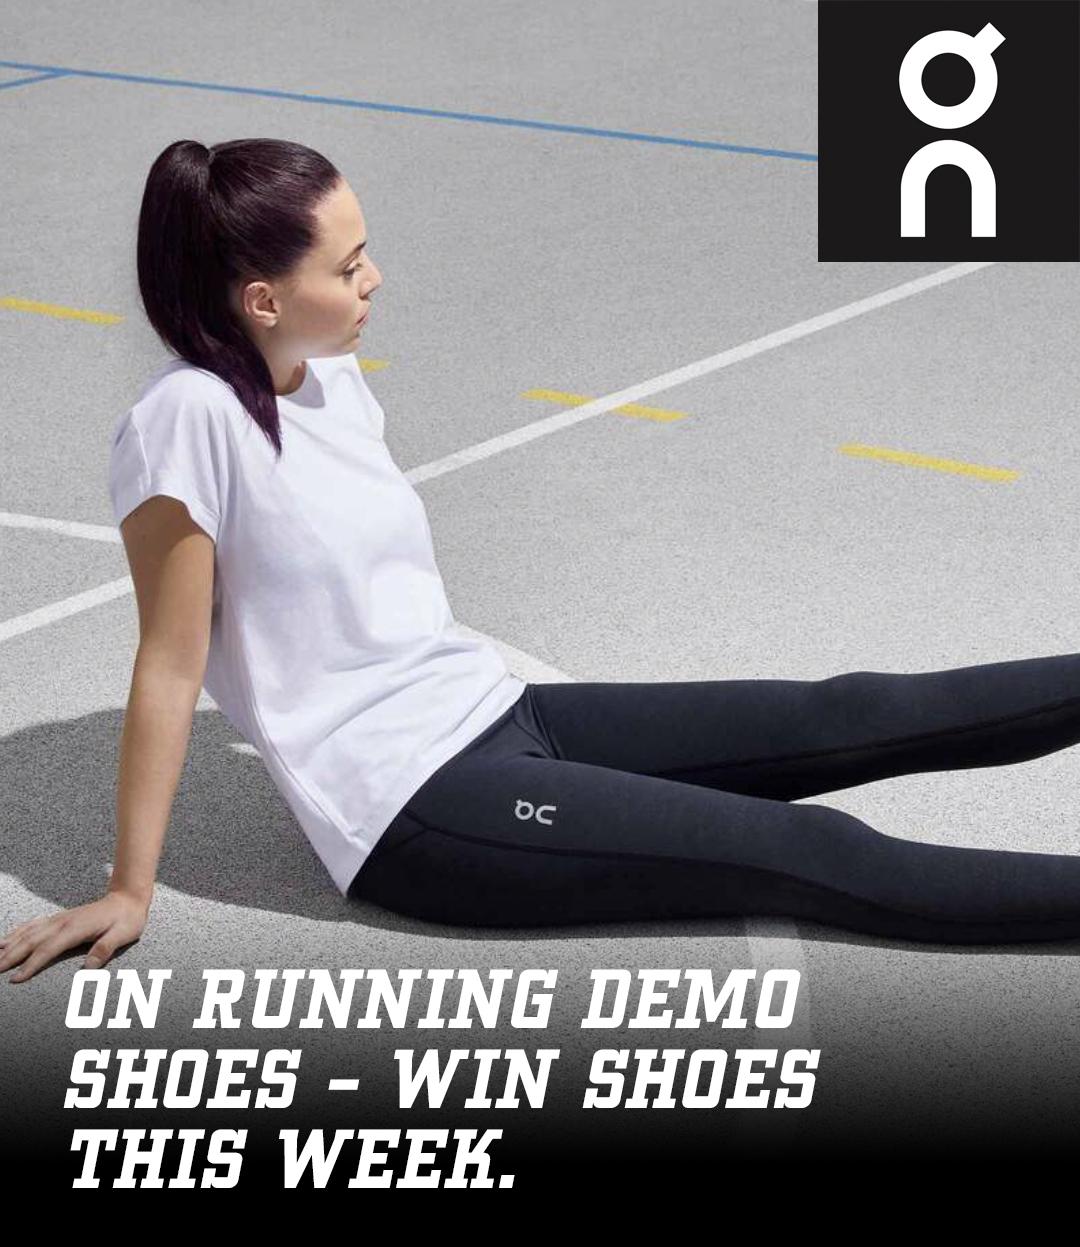 on running demos